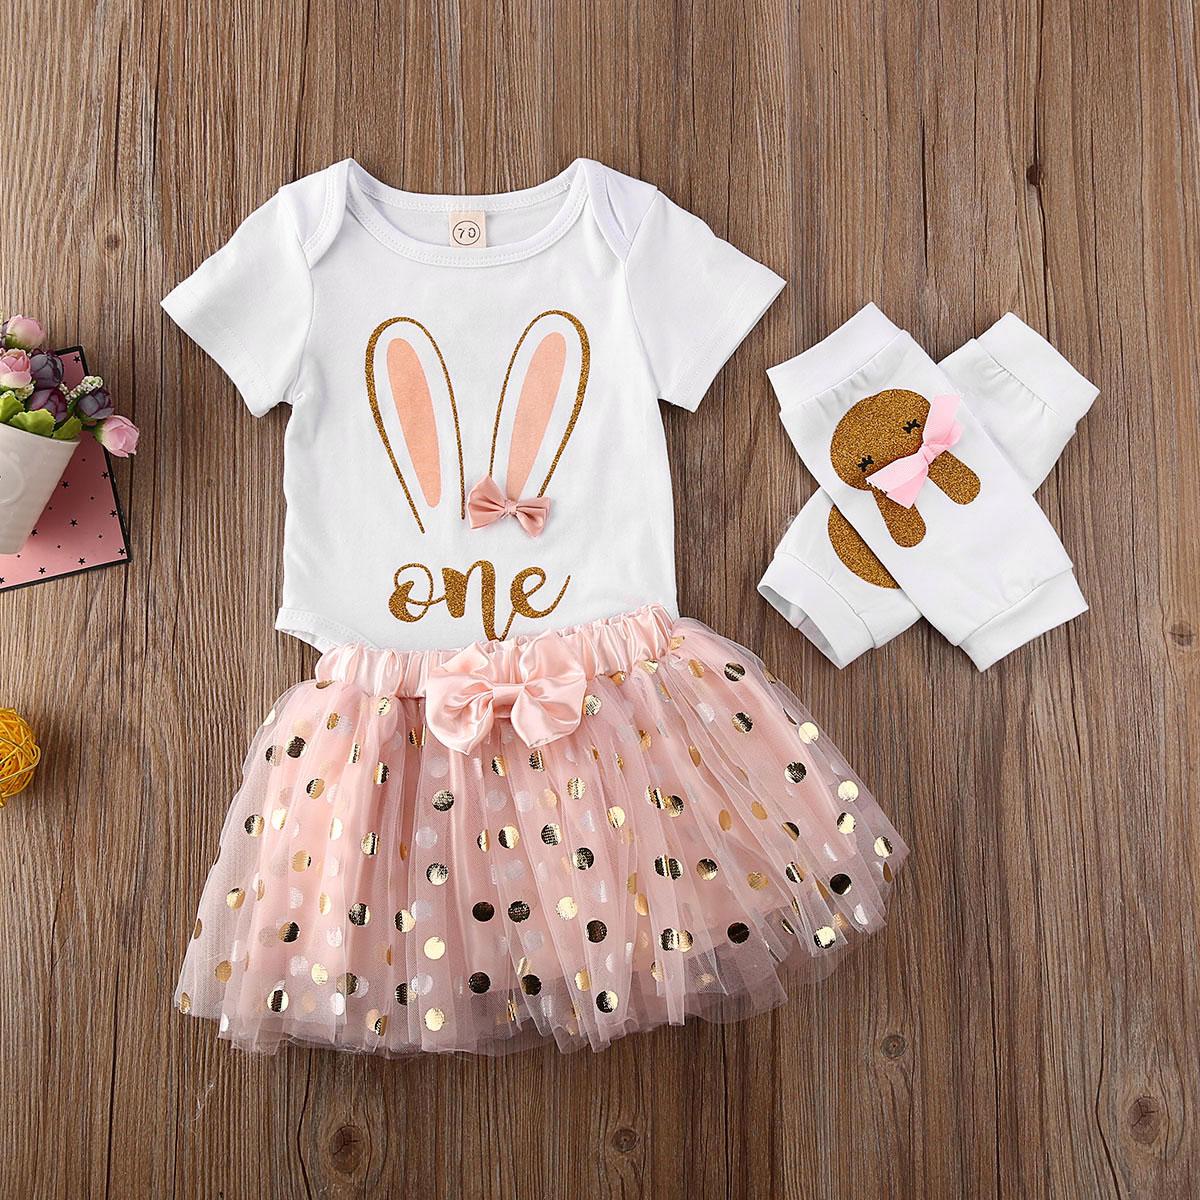 Newborn Toddler Baby Girl Short Sleeve Floral Print Romper Jumpsuit Tulle Tutu Skirt Dress Outfits